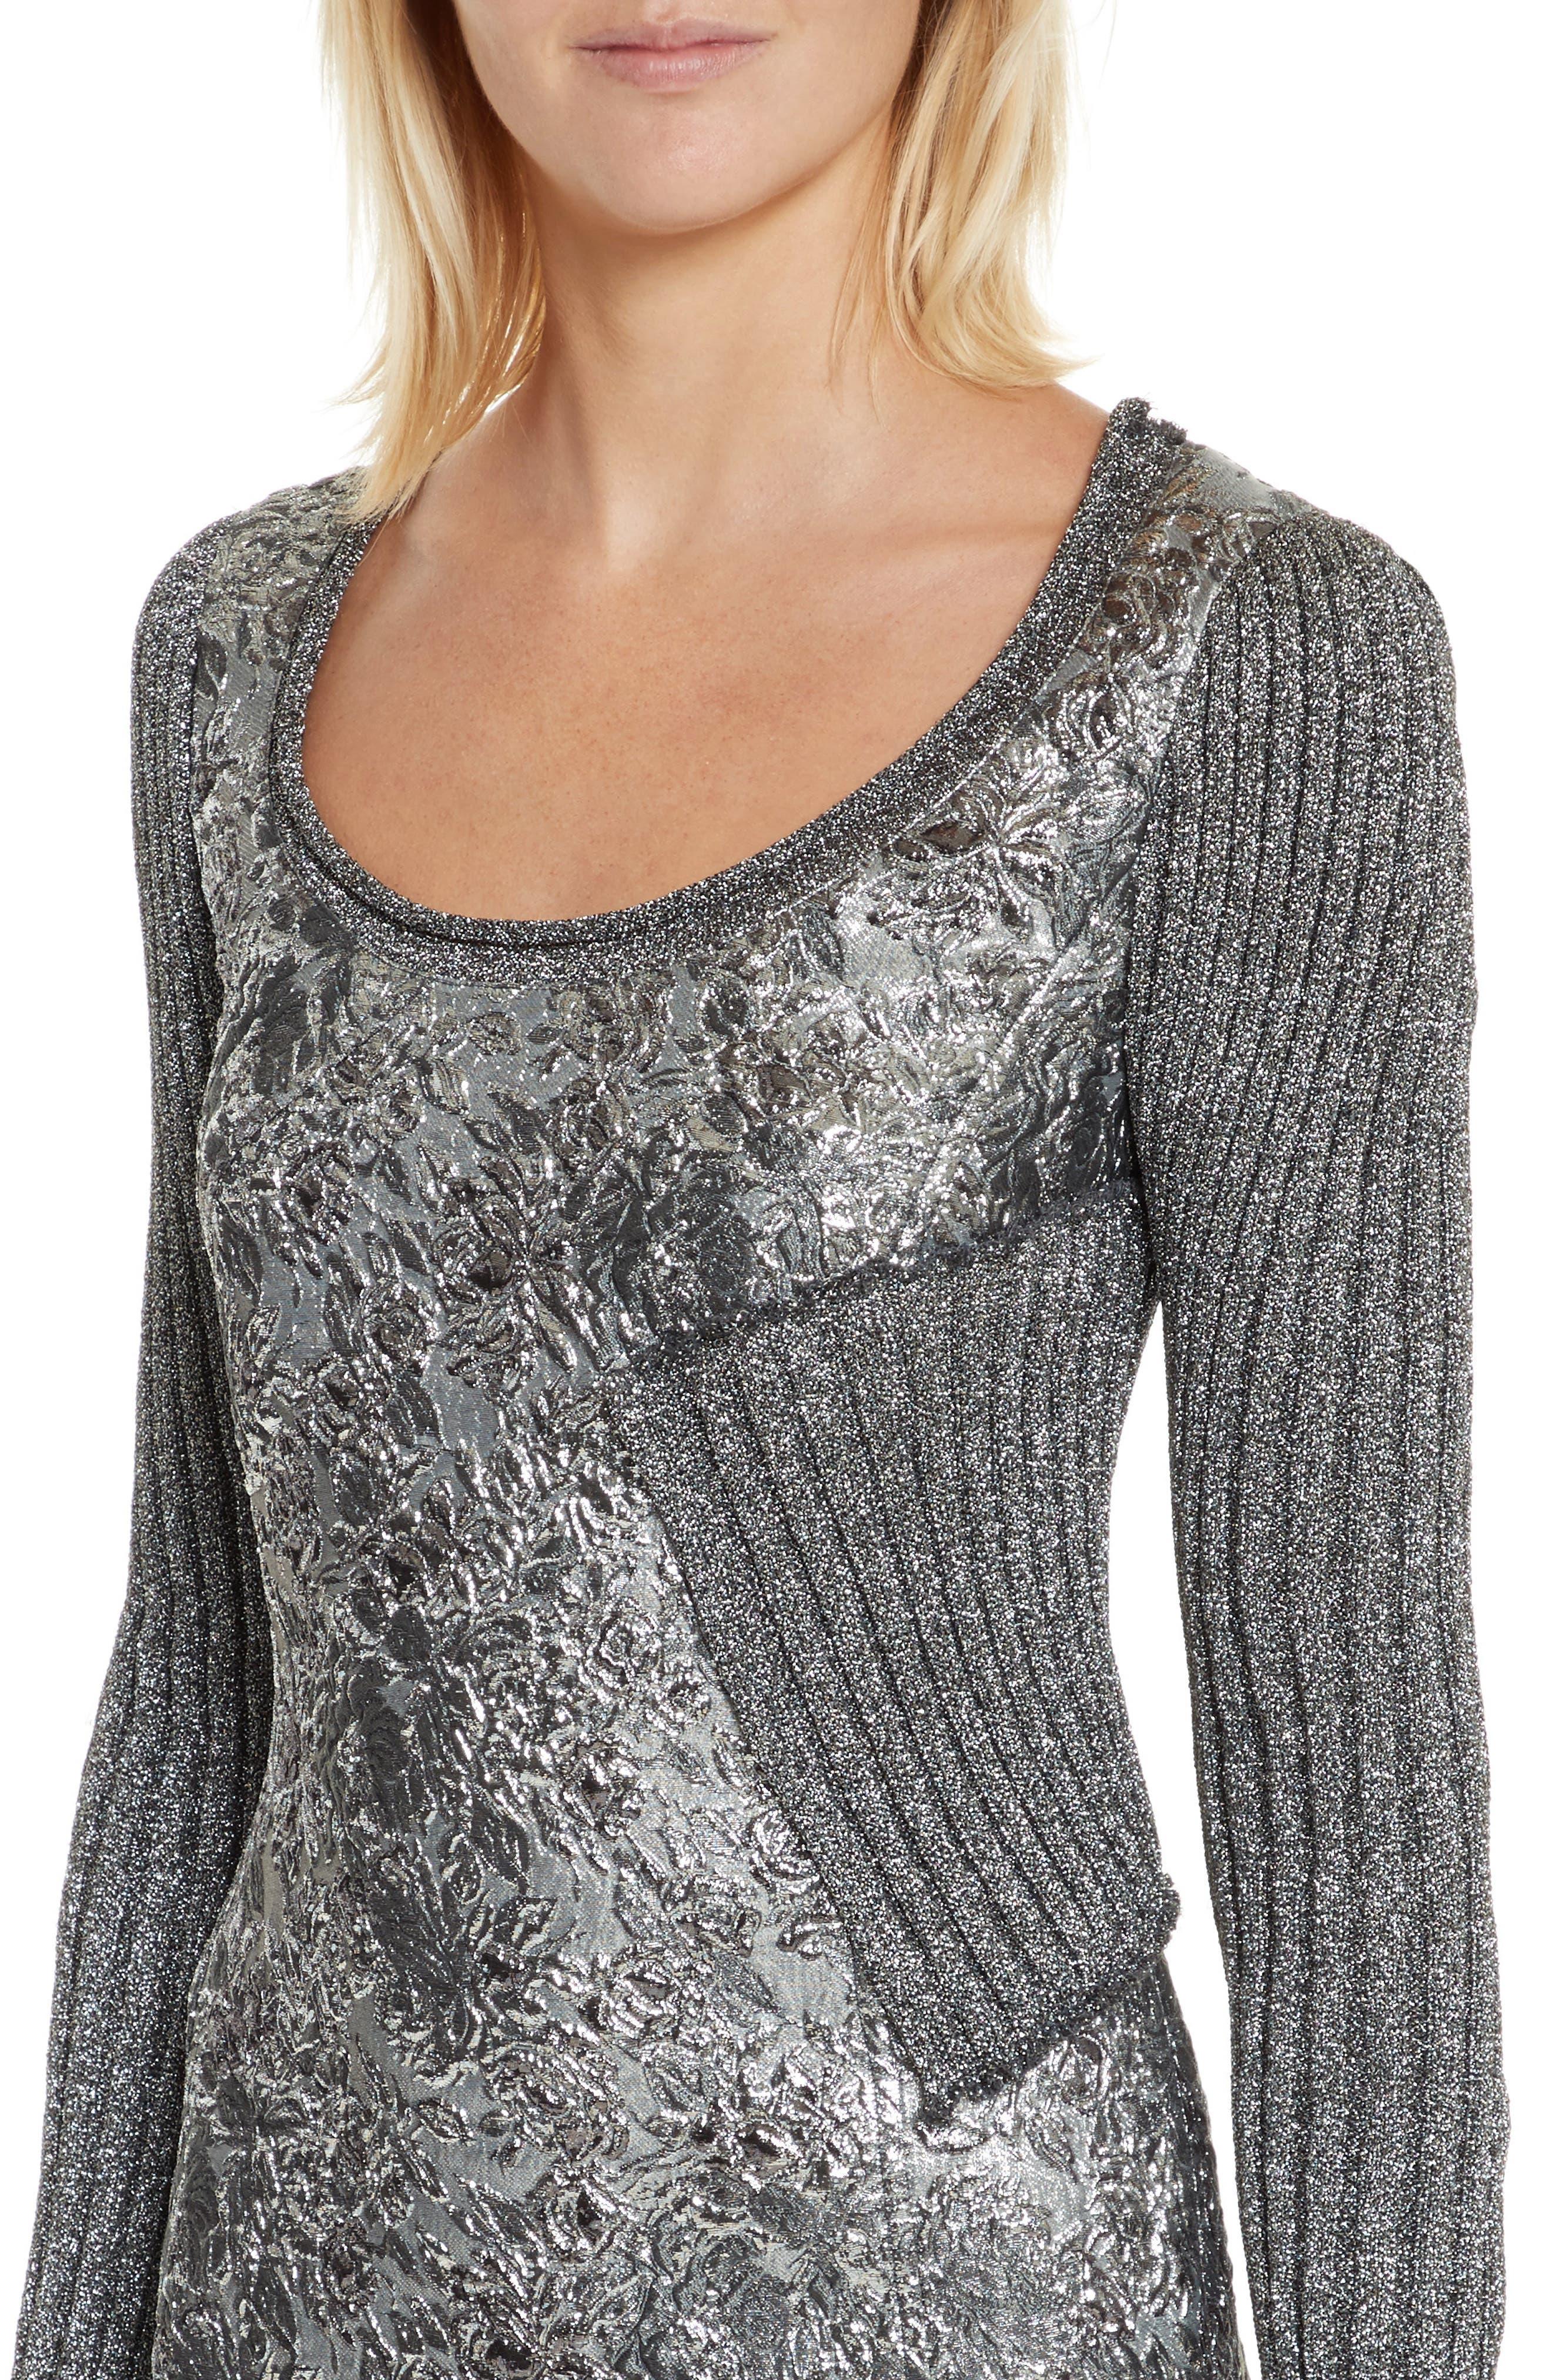 Mixed Media Metallic Sweater Dress,                             Alternate thumbnail 4, color,                             040